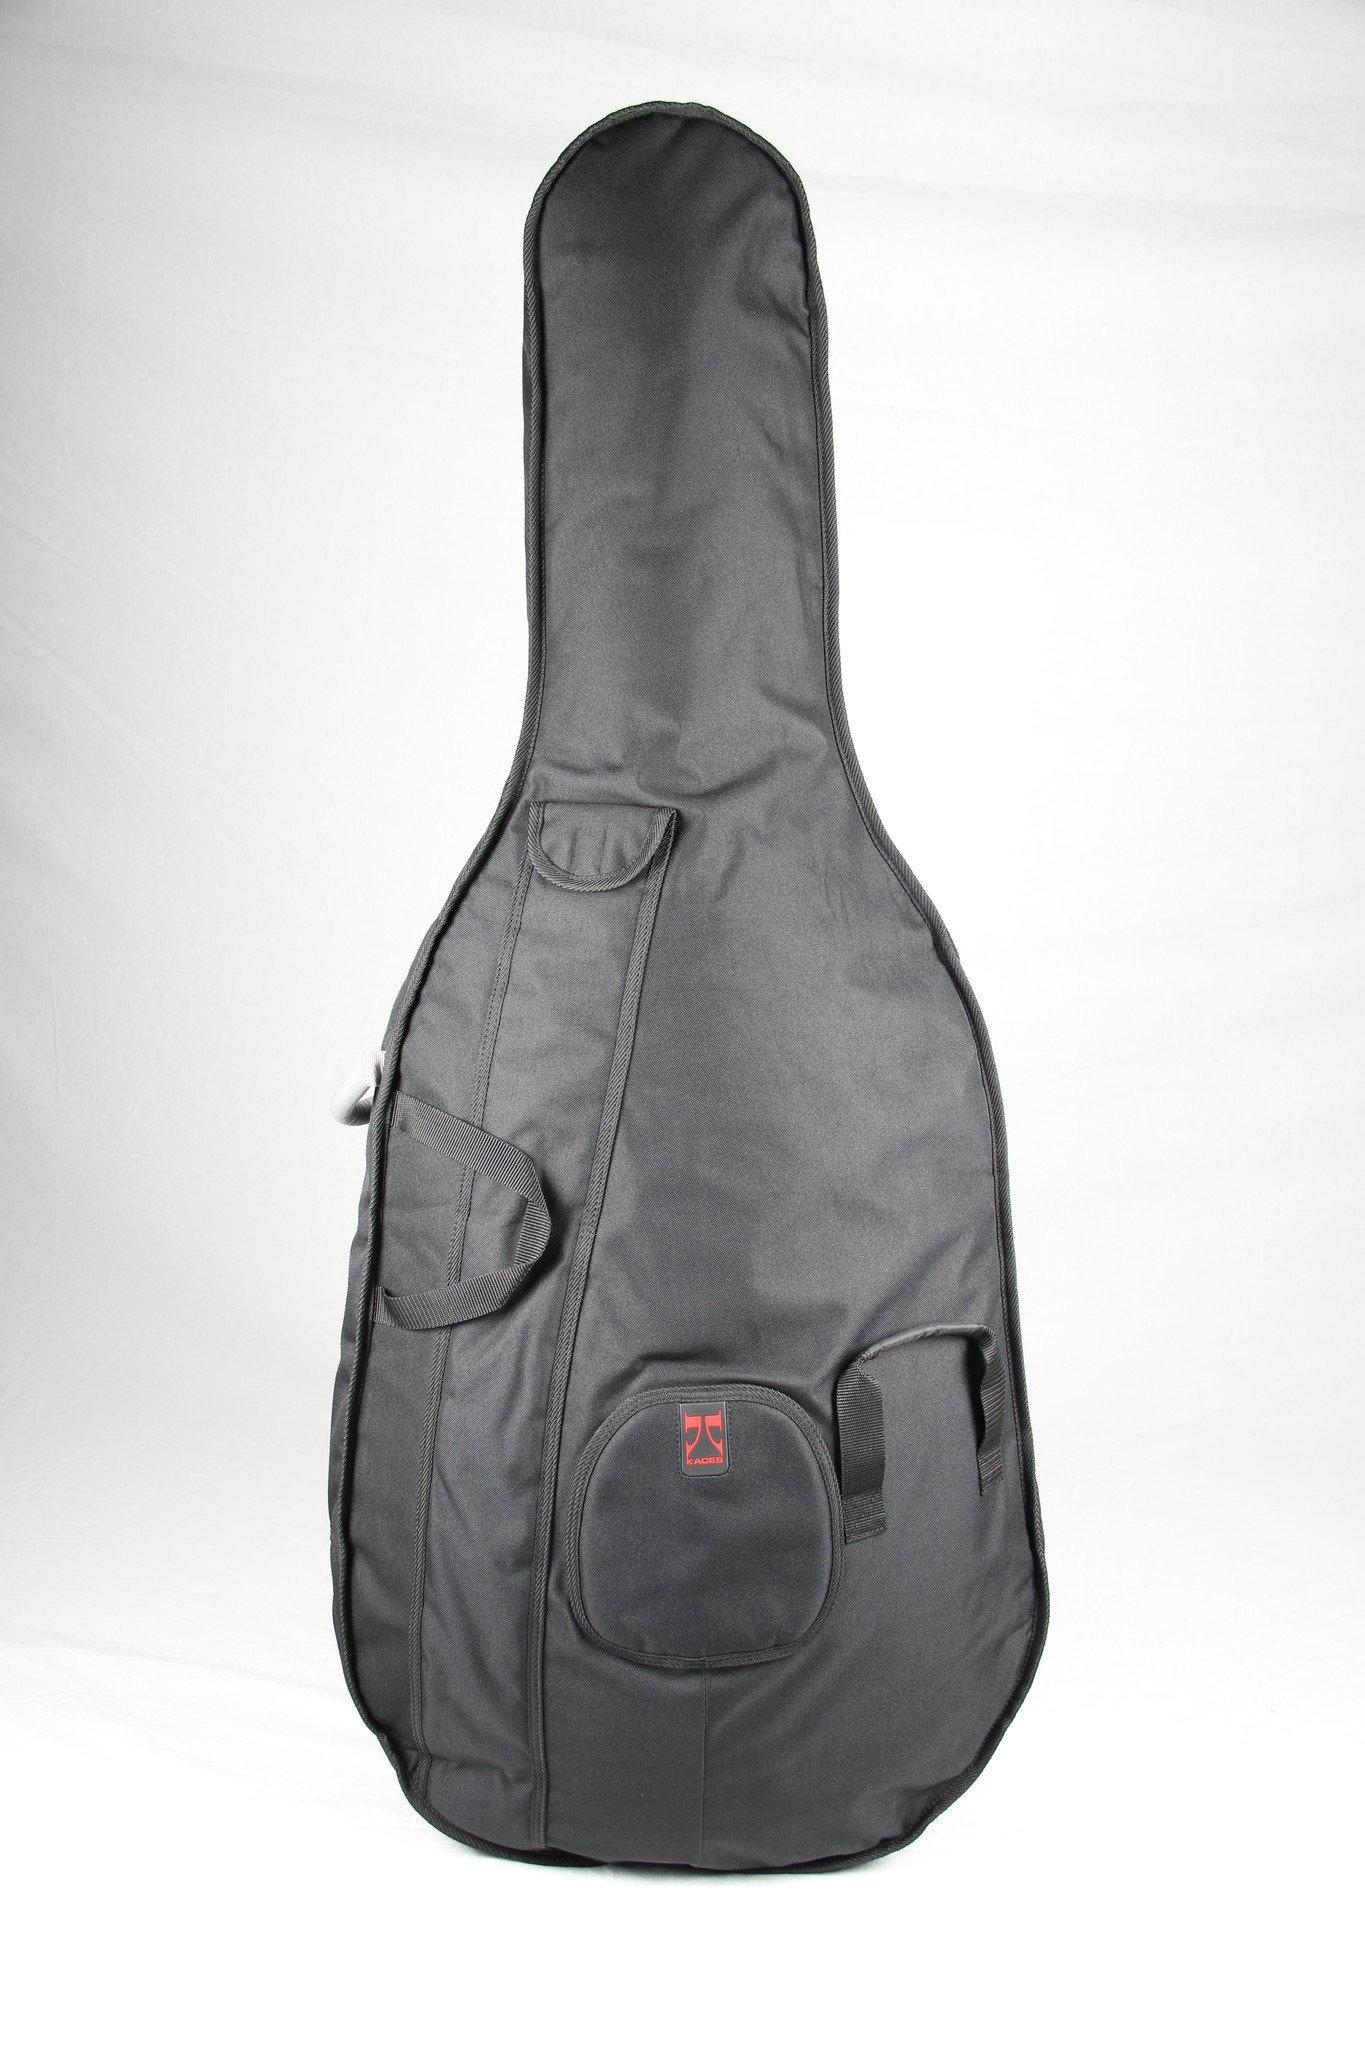 University Series 3/4 Size Upright Bass Bag